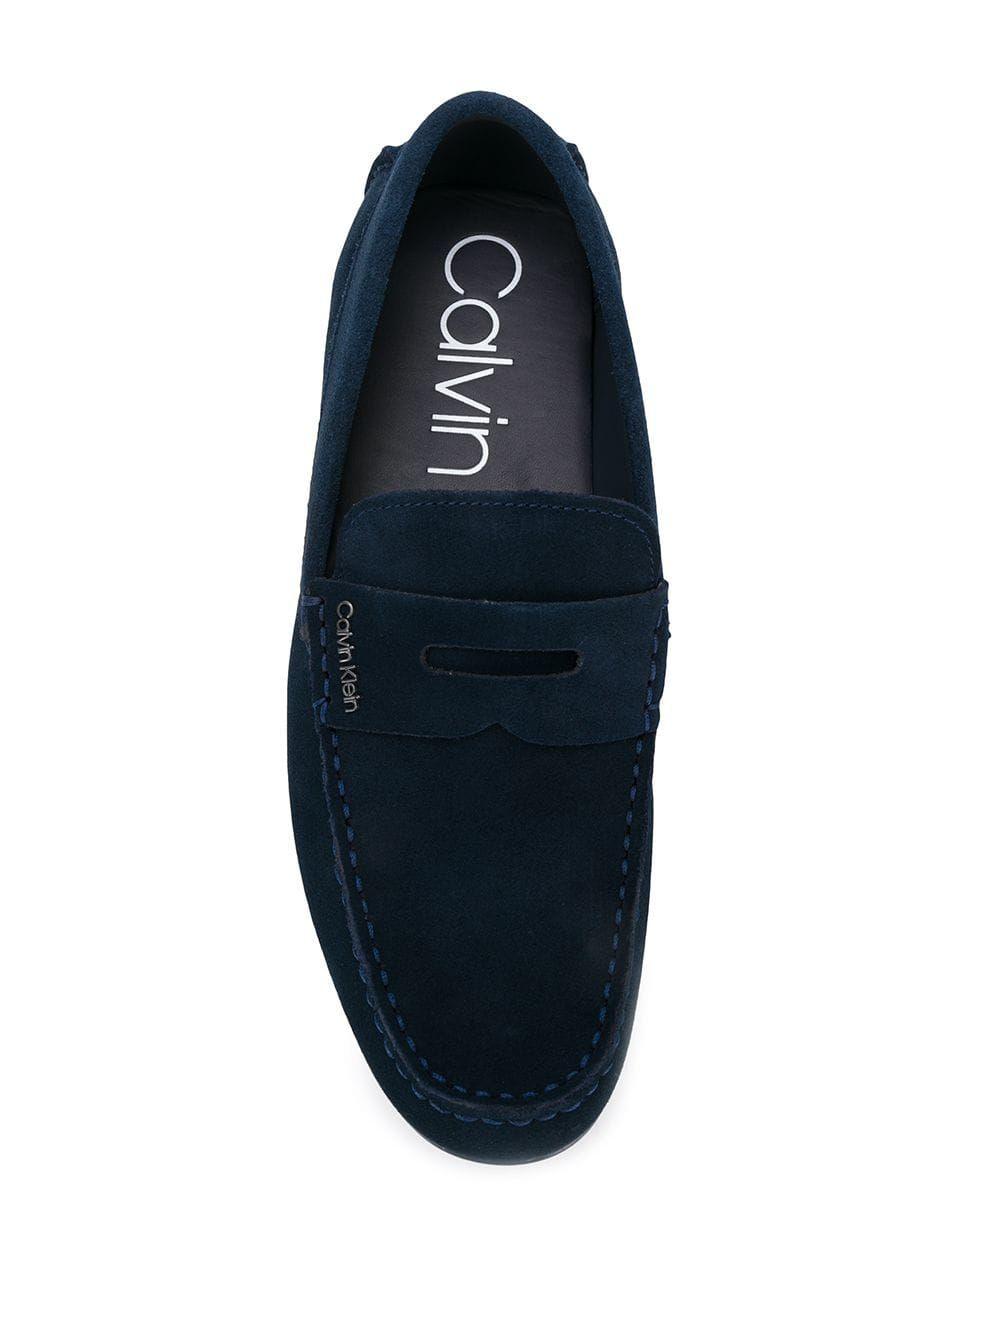 gran descuento d0d08 d9a5f Calvin Klein Jeans Mocasines Con Logo   Clynes en 2019 ...